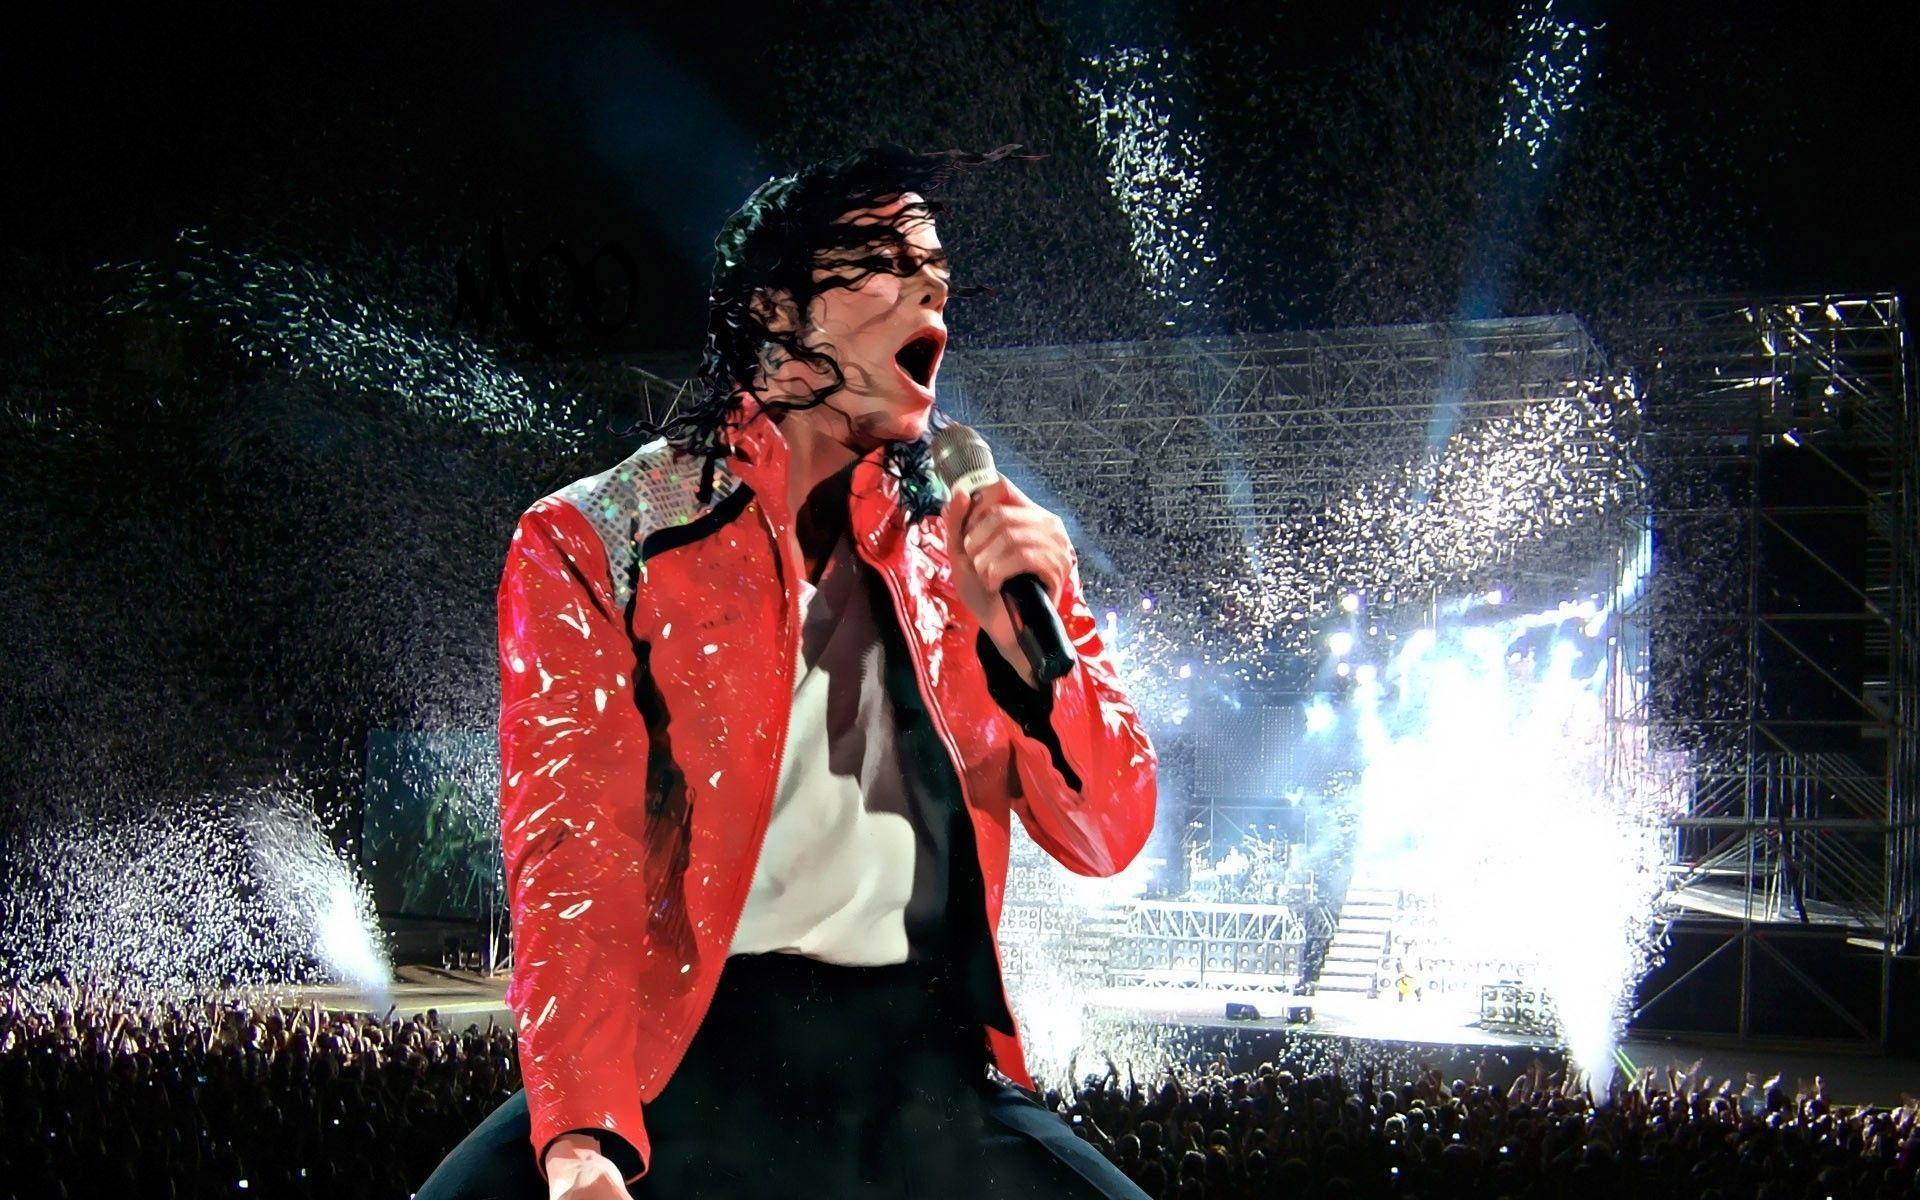 Michael Jackson Wallpaper Hd wallpaper - 892626